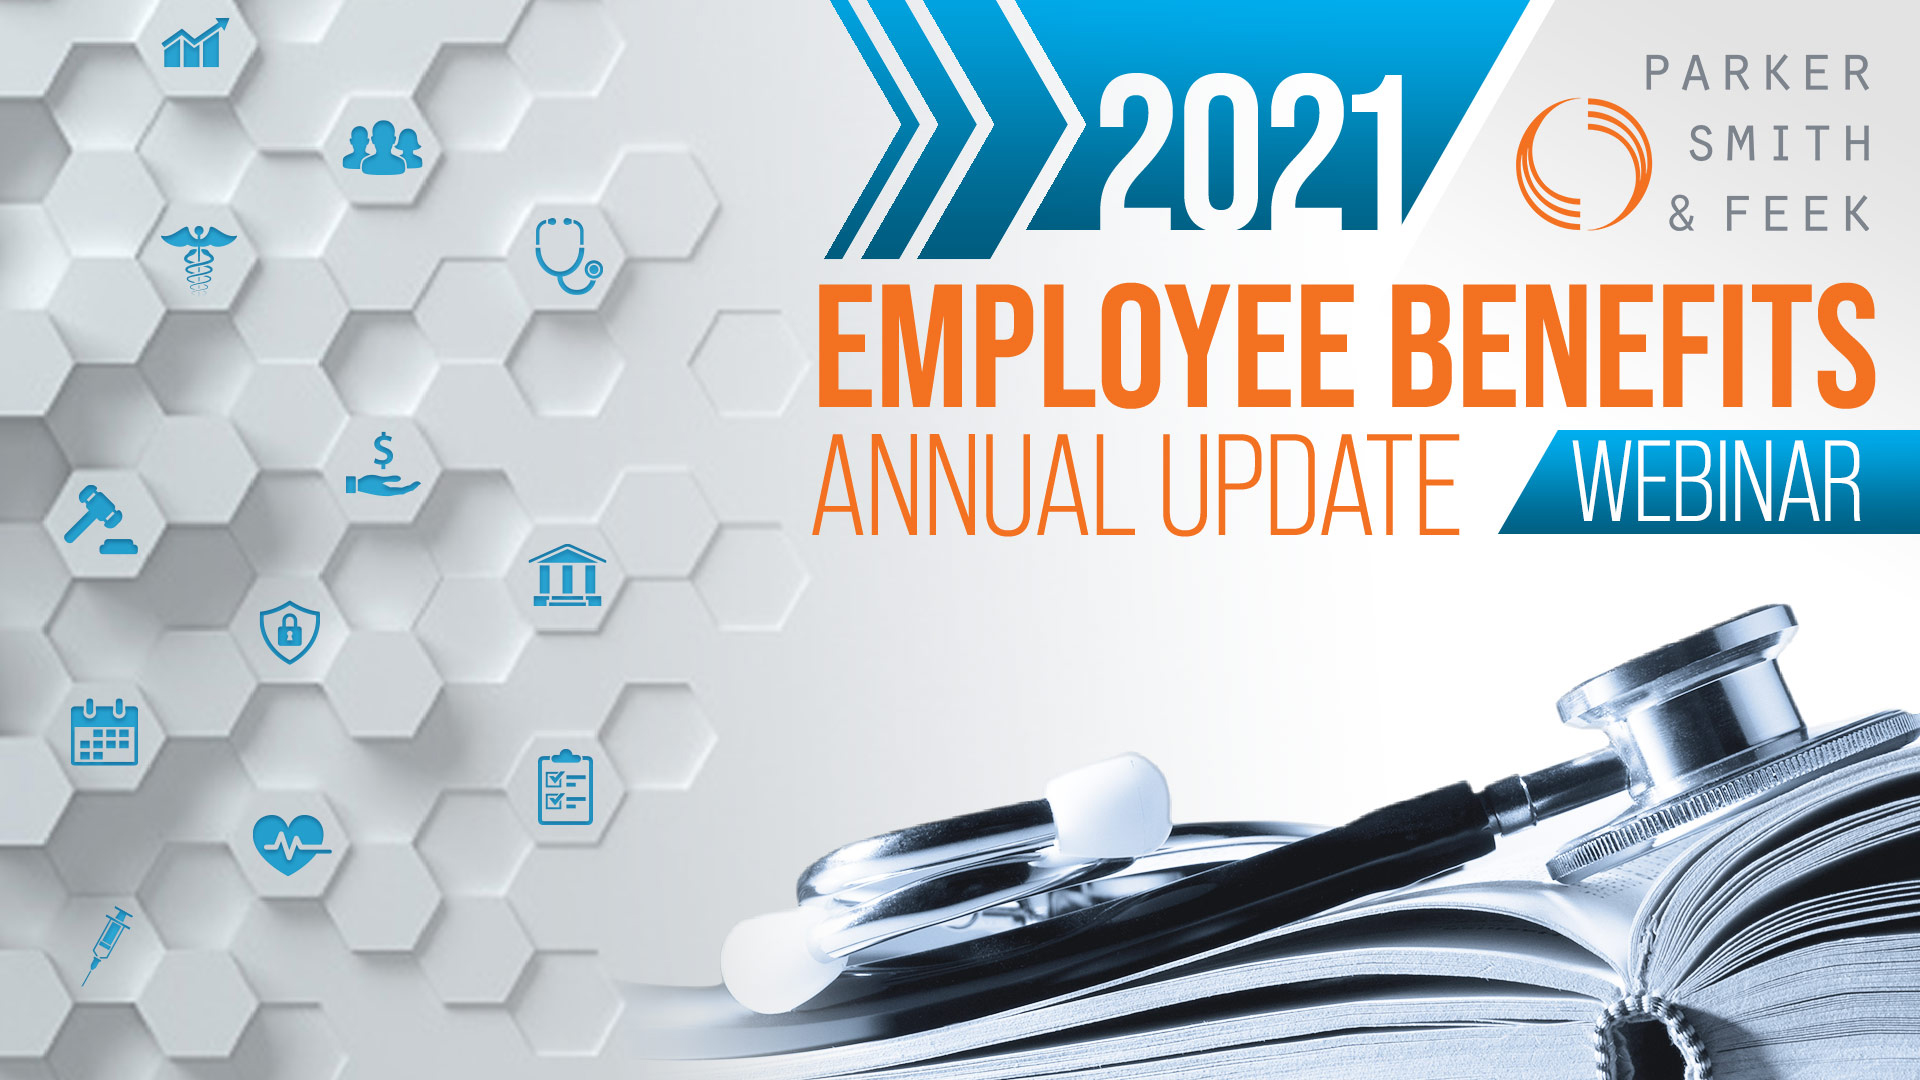 2021 Annual Employee Benefits Update Webinar